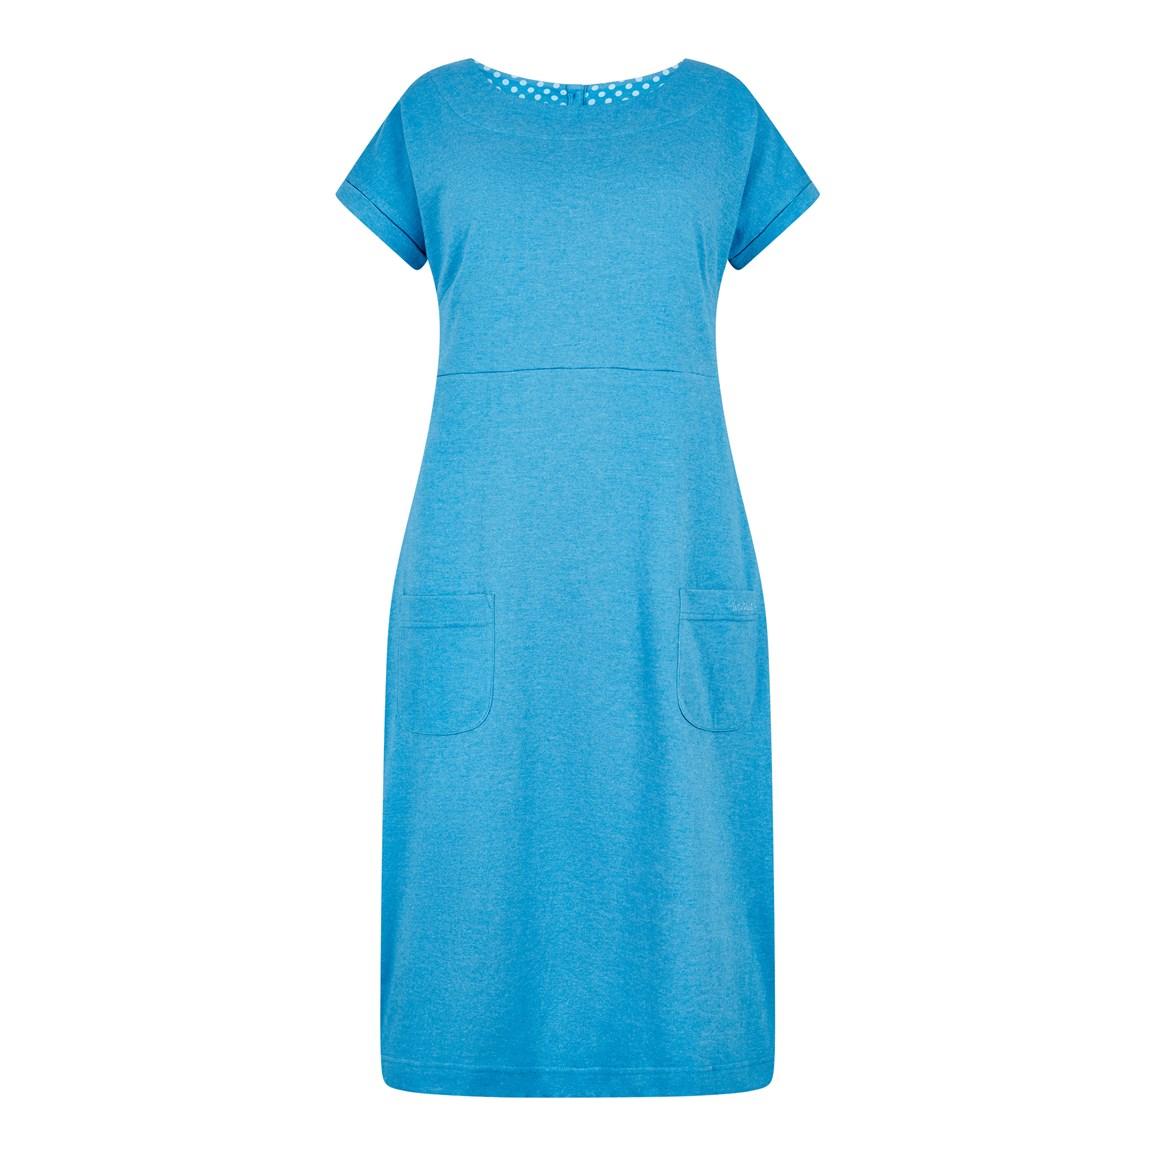 Women's Dresses & Skirts Weird Fish Talia Plain Jersey Dress Blue Wash Size 20